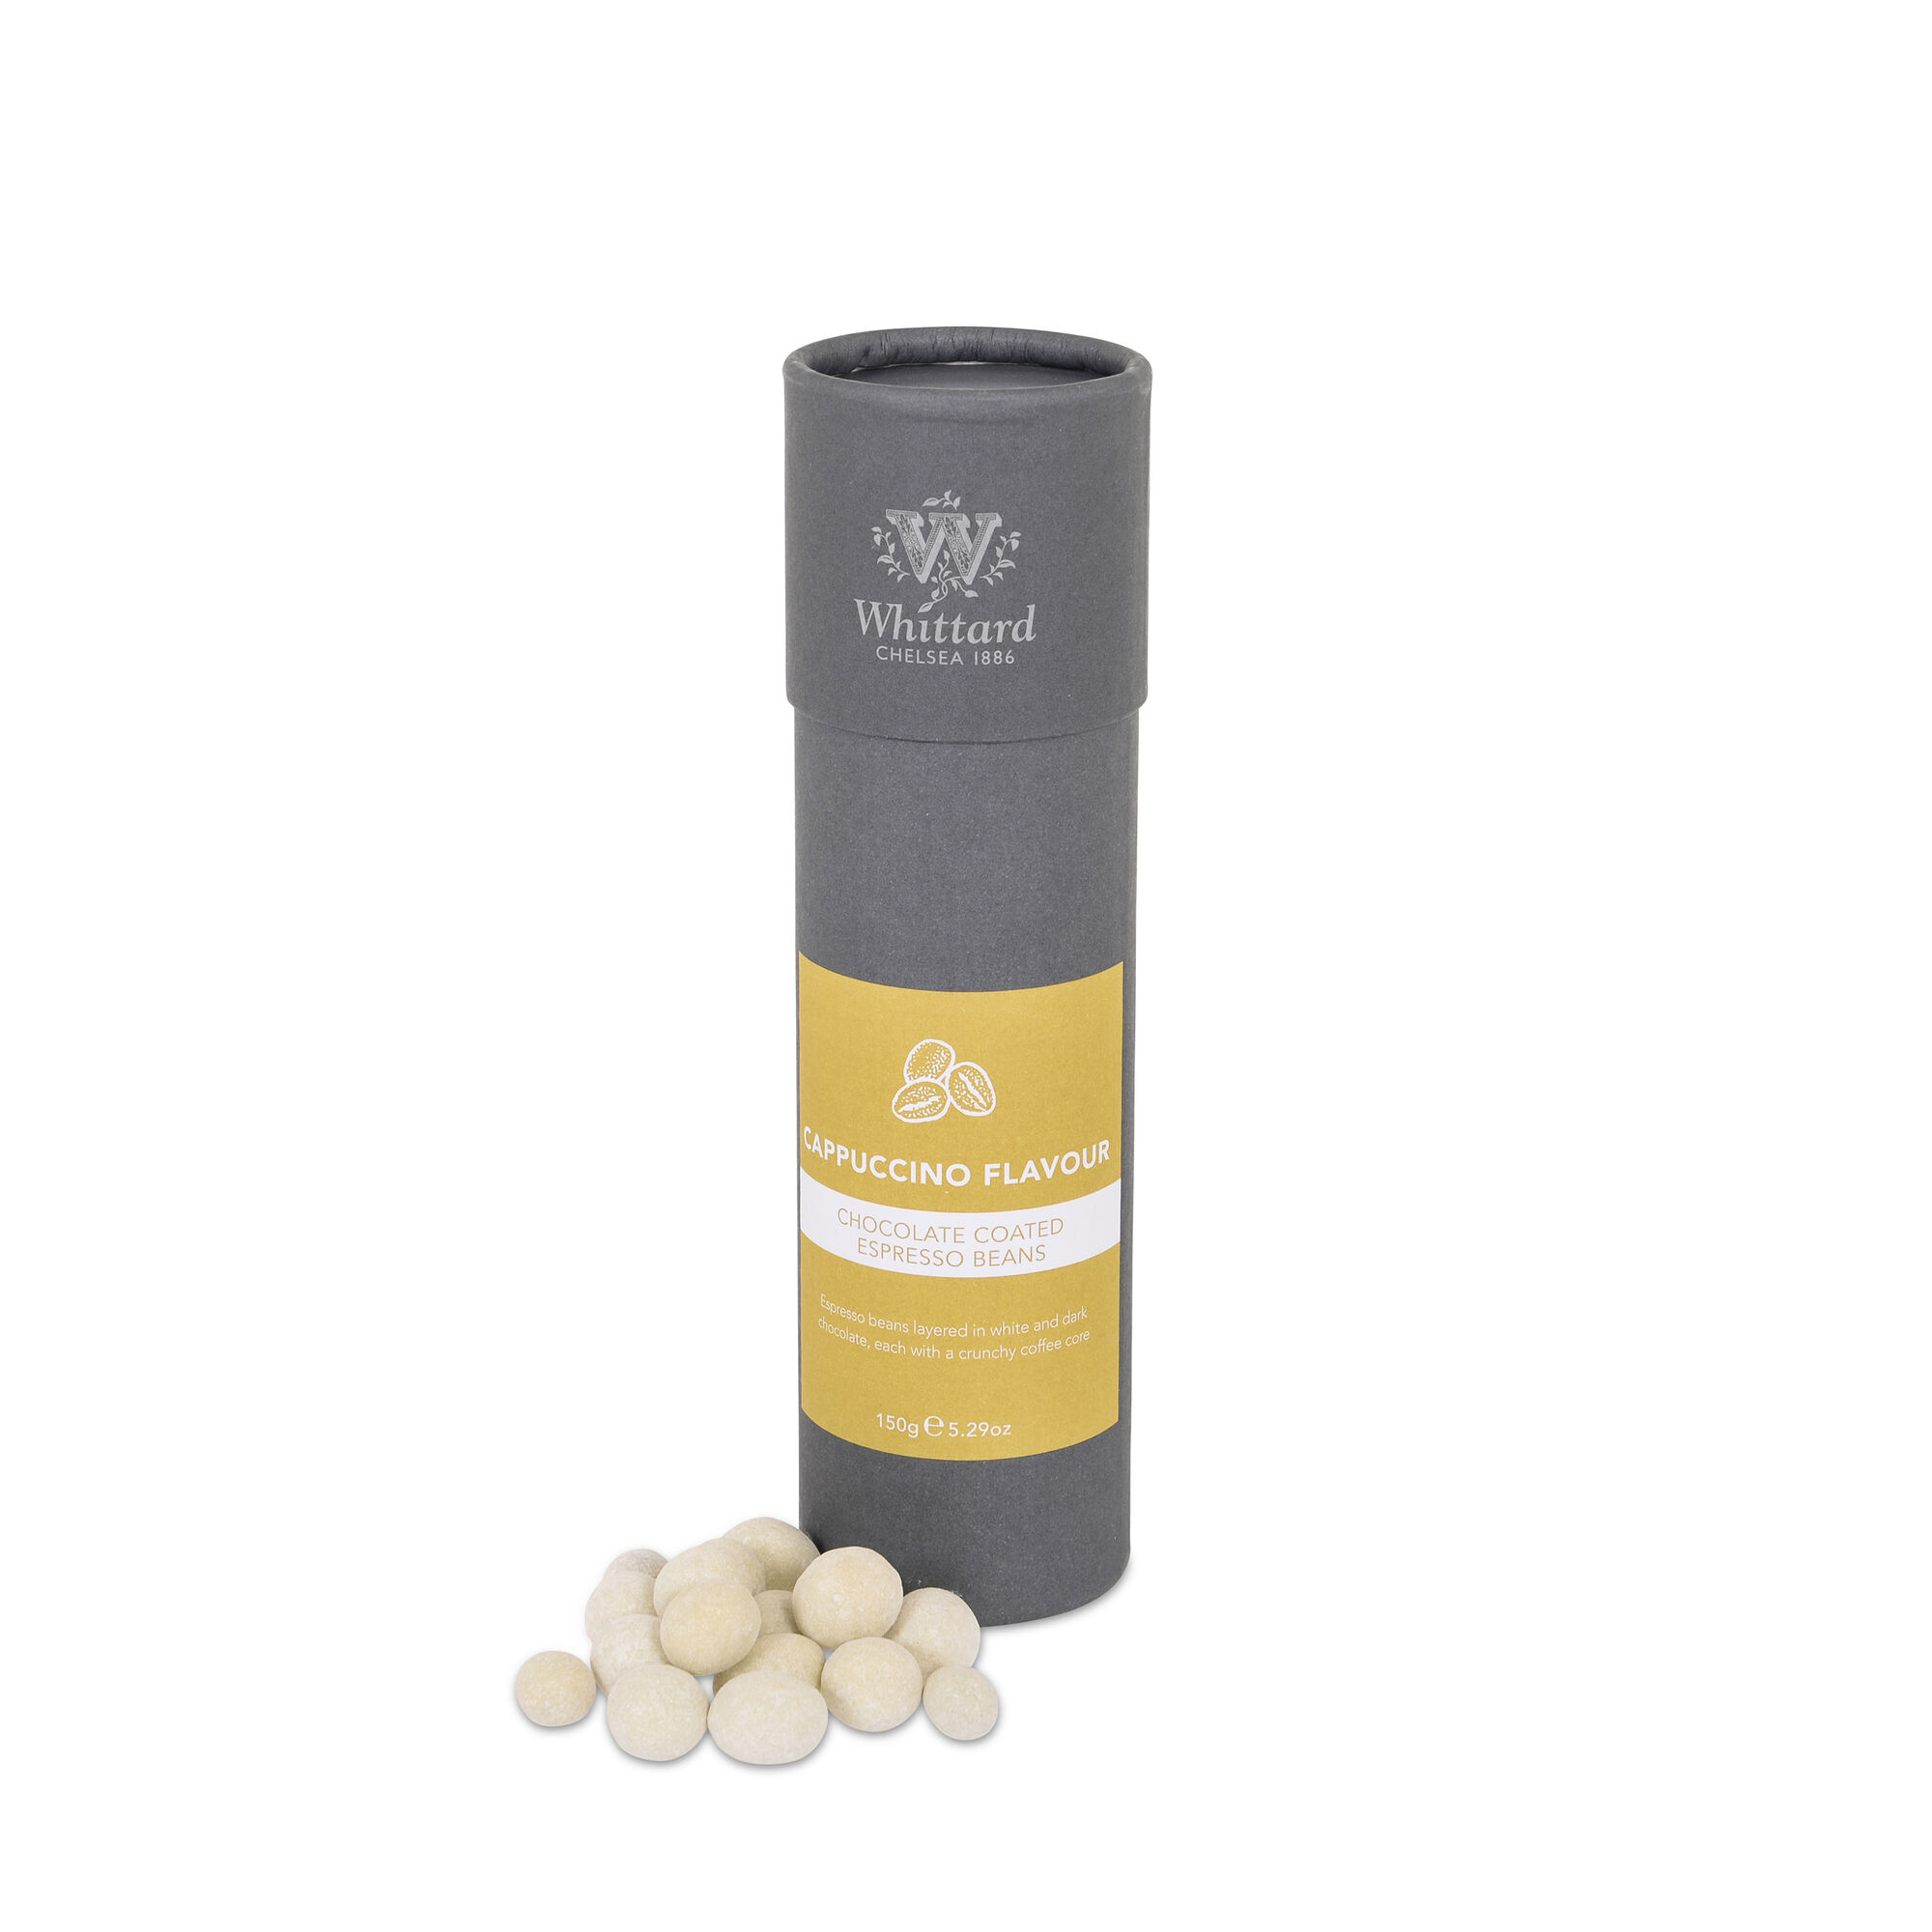 Cappuccino Flavour Espresso Beans Whittard Of Chelsea Aaist Whole Hazelnut Milk Chocolate 100 Gram